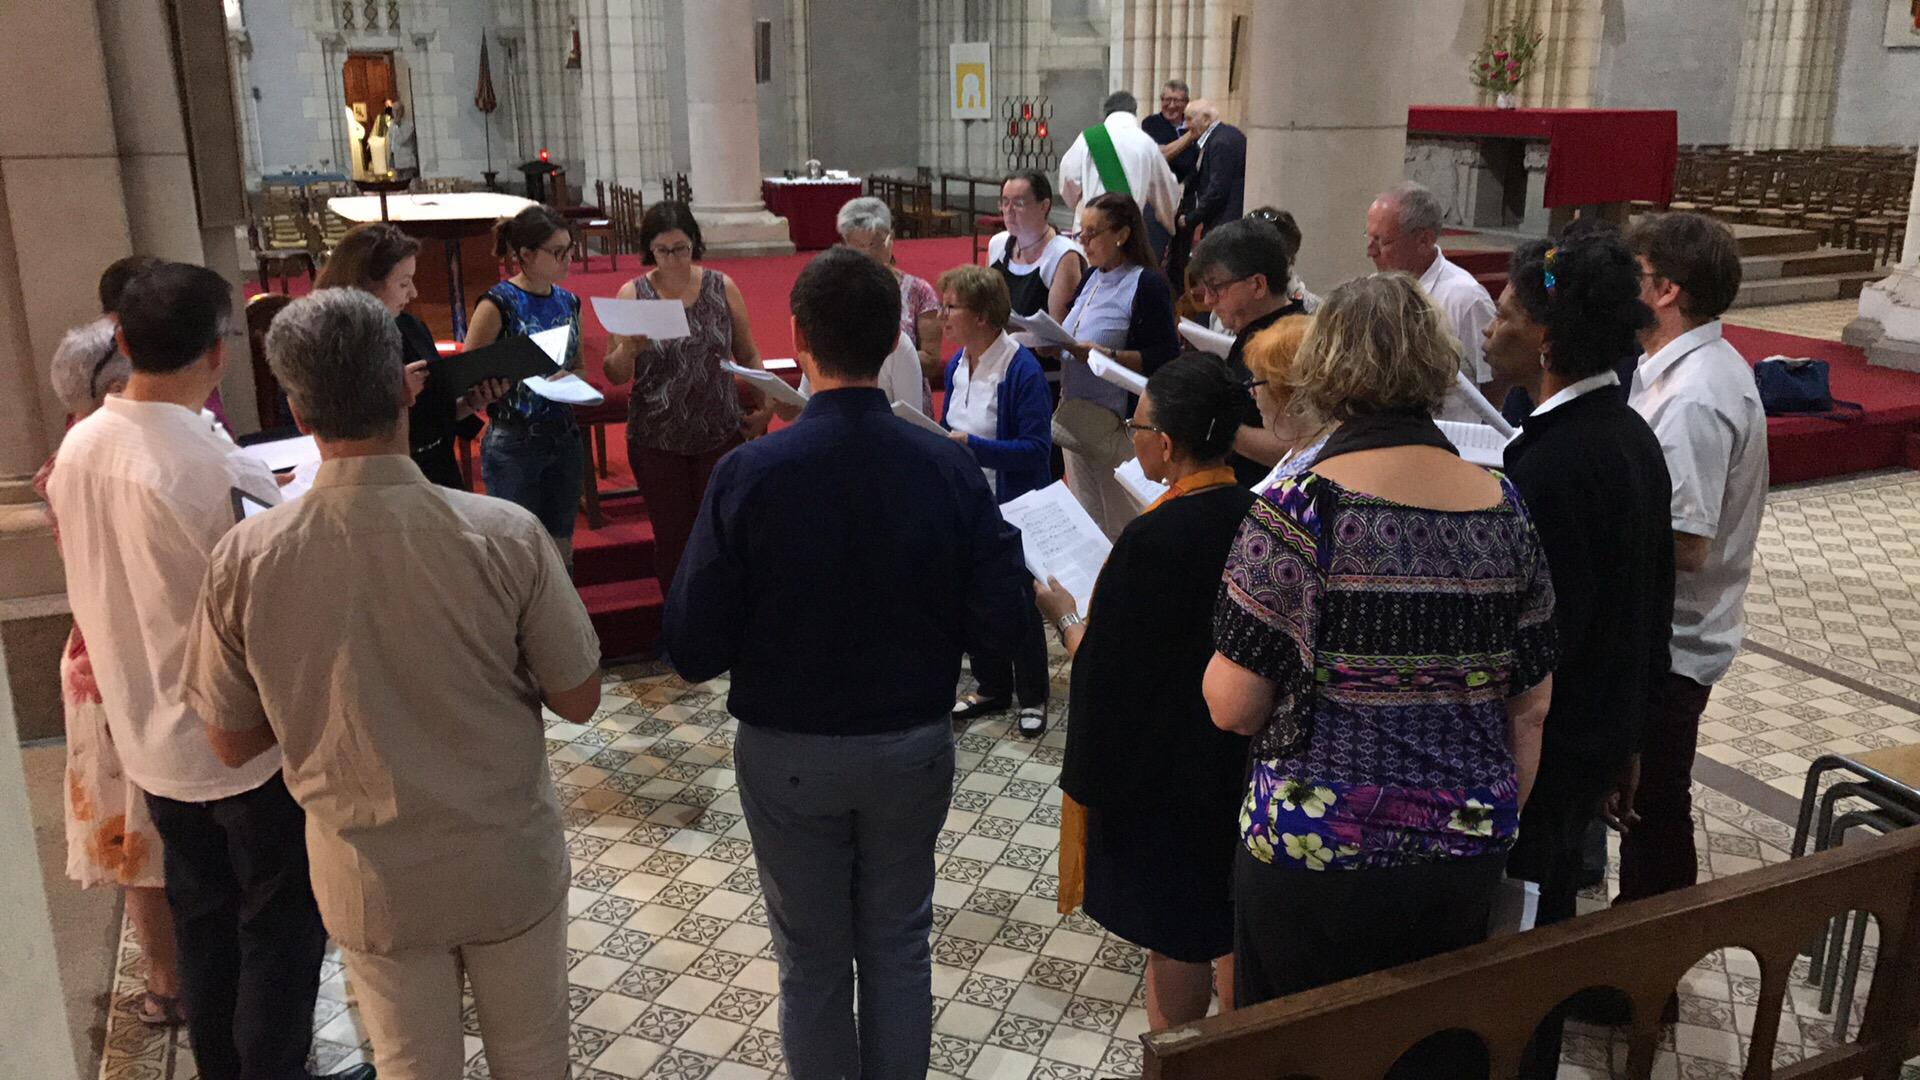 choeur grégorien avant la messe.jpg